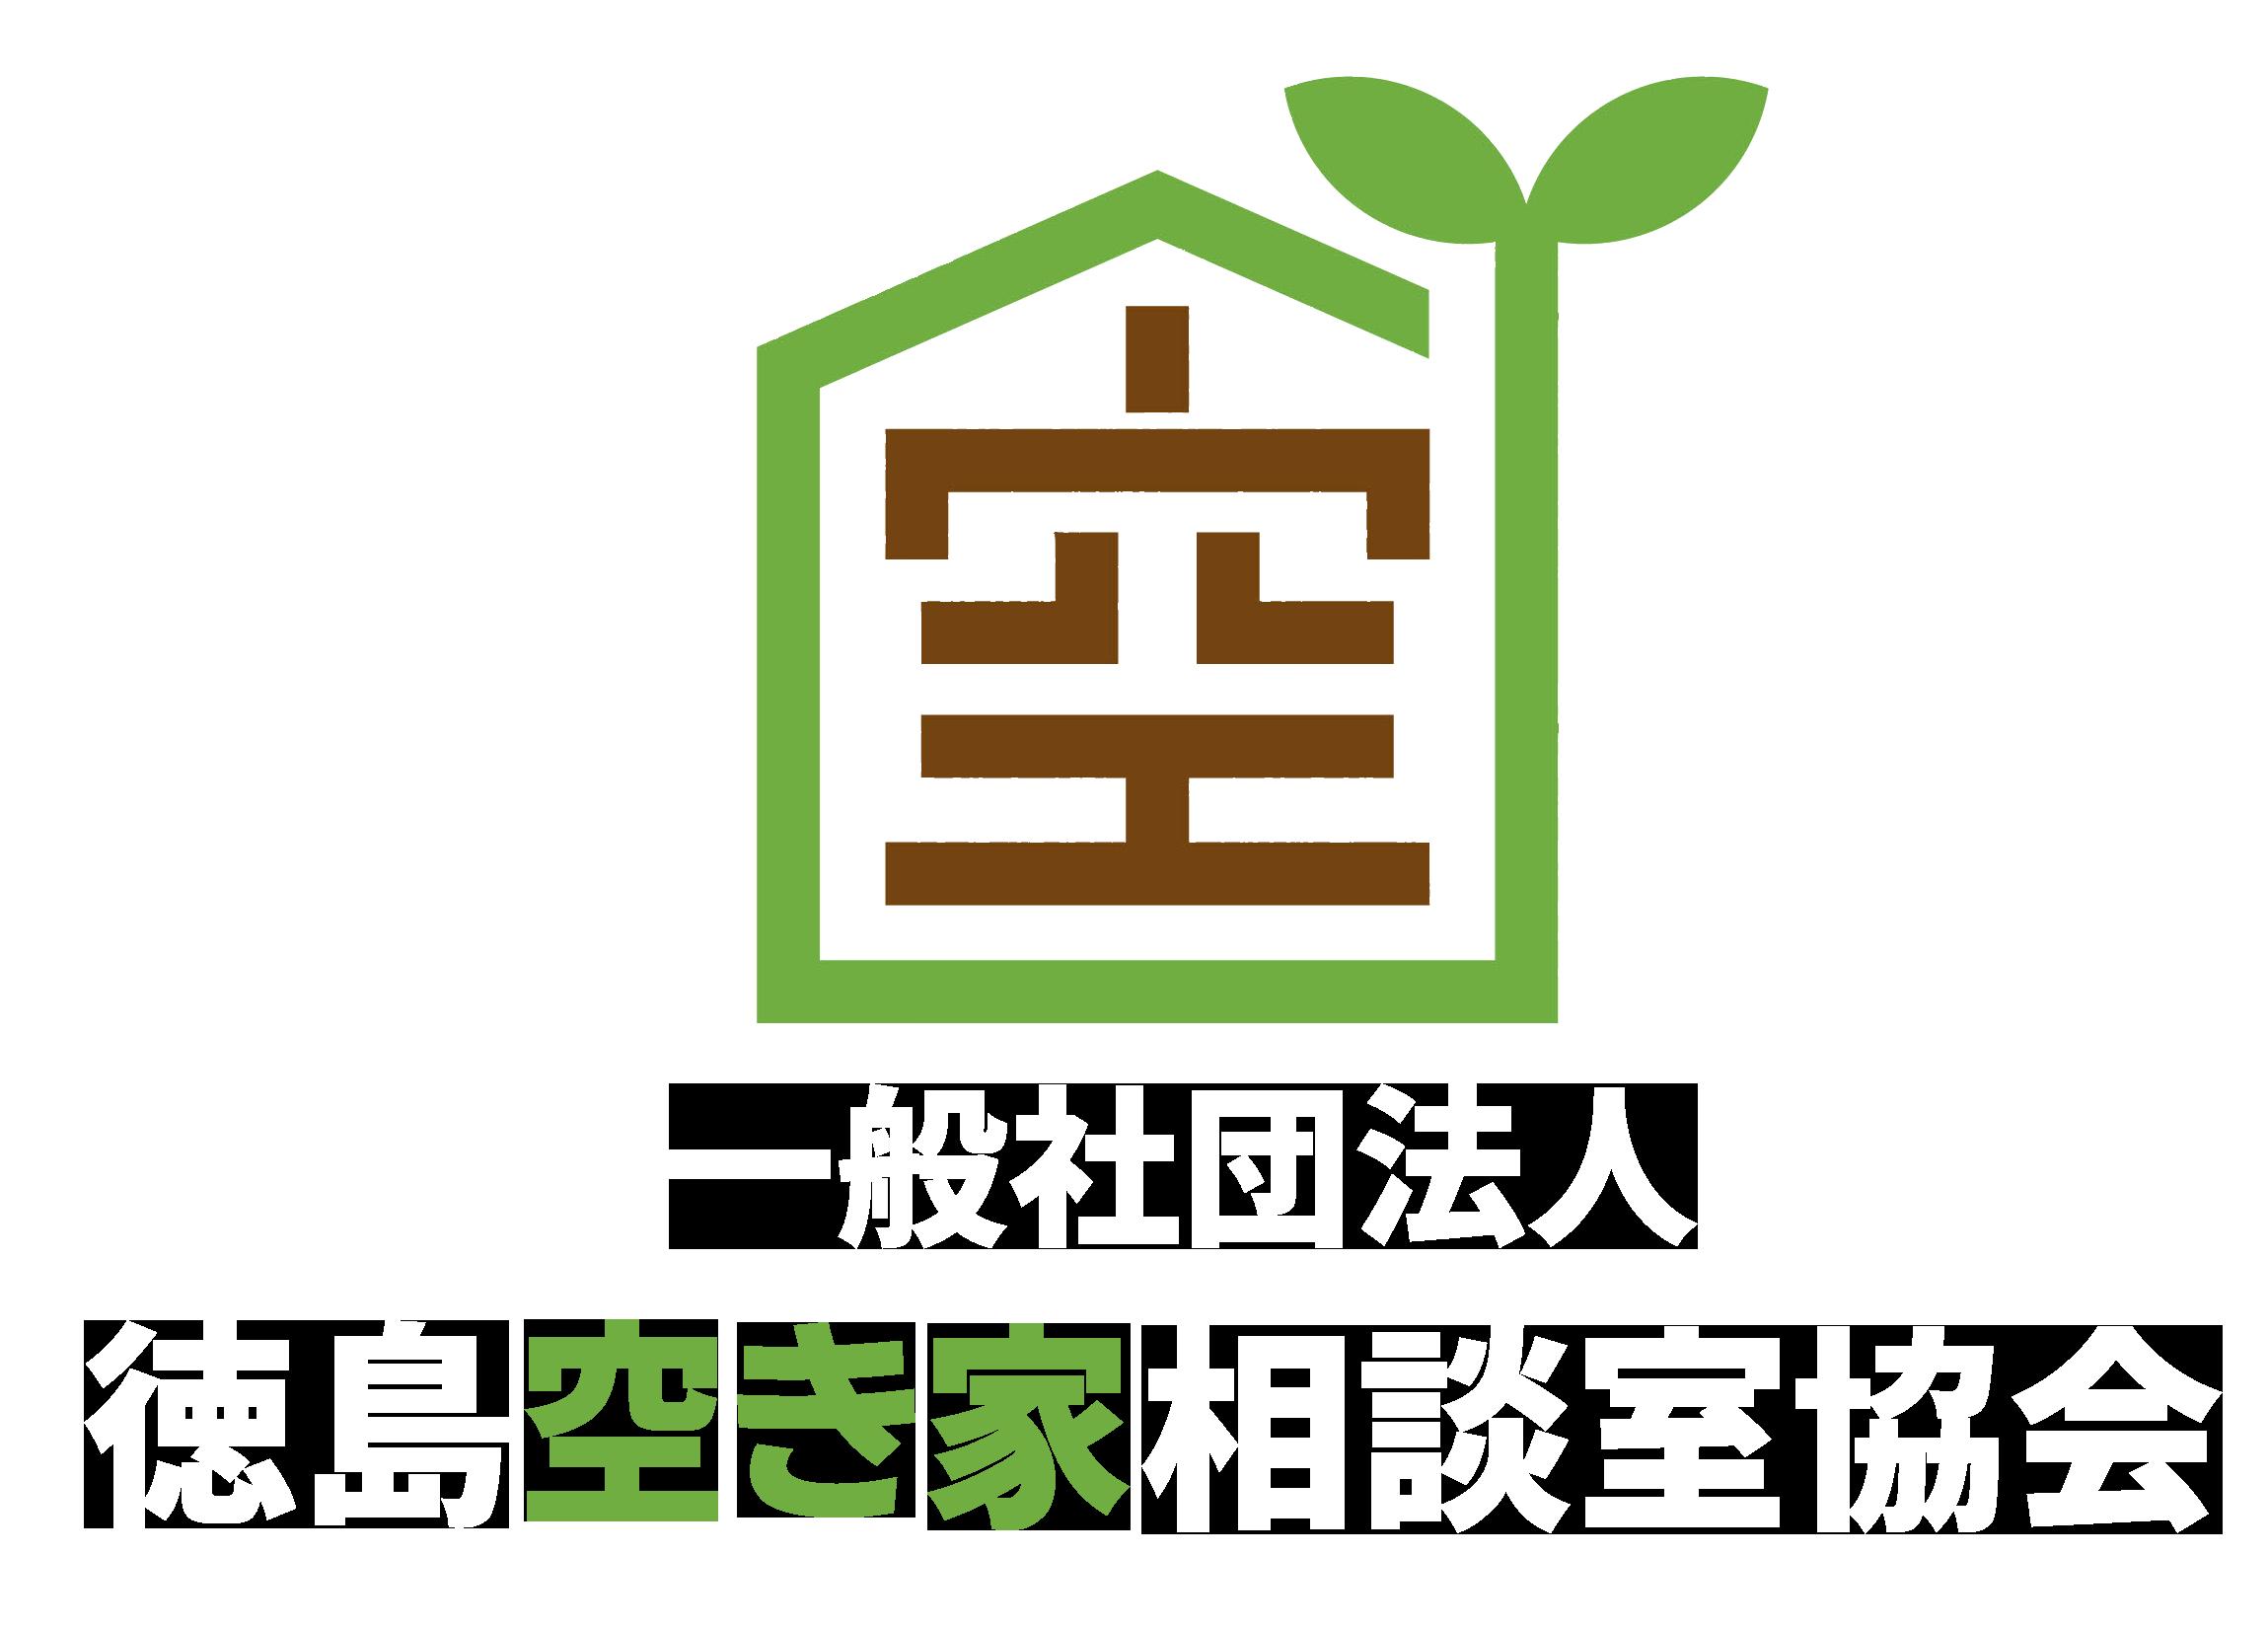 ■A_空き家ロゴ_0201